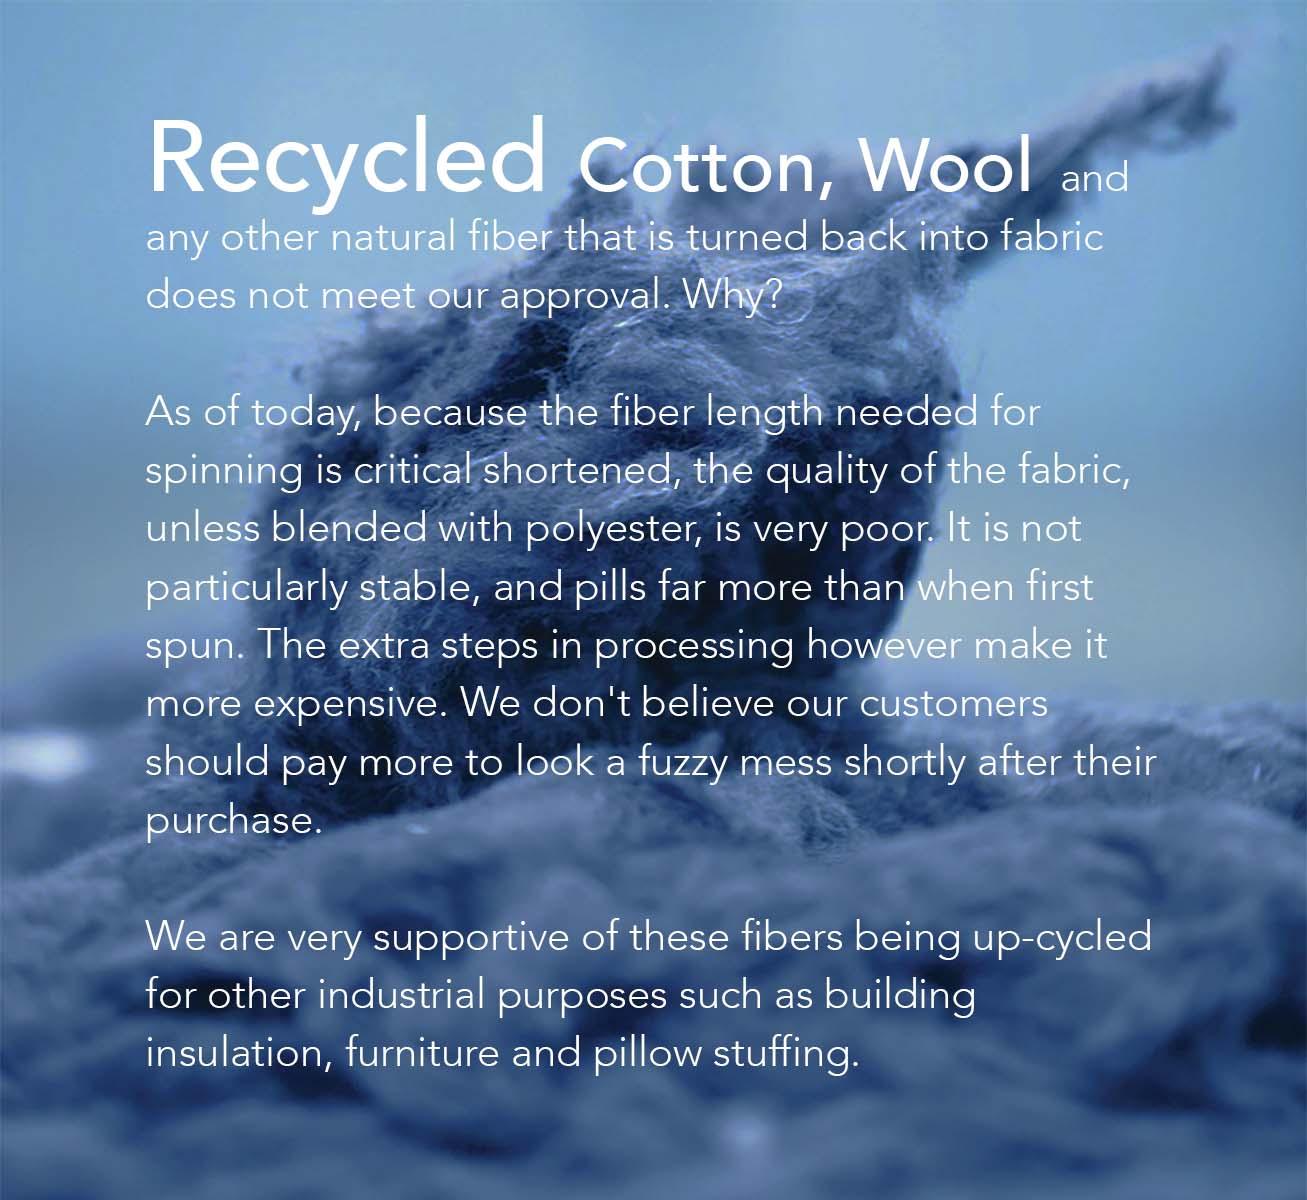 Recycled-natural-fibers.jpg